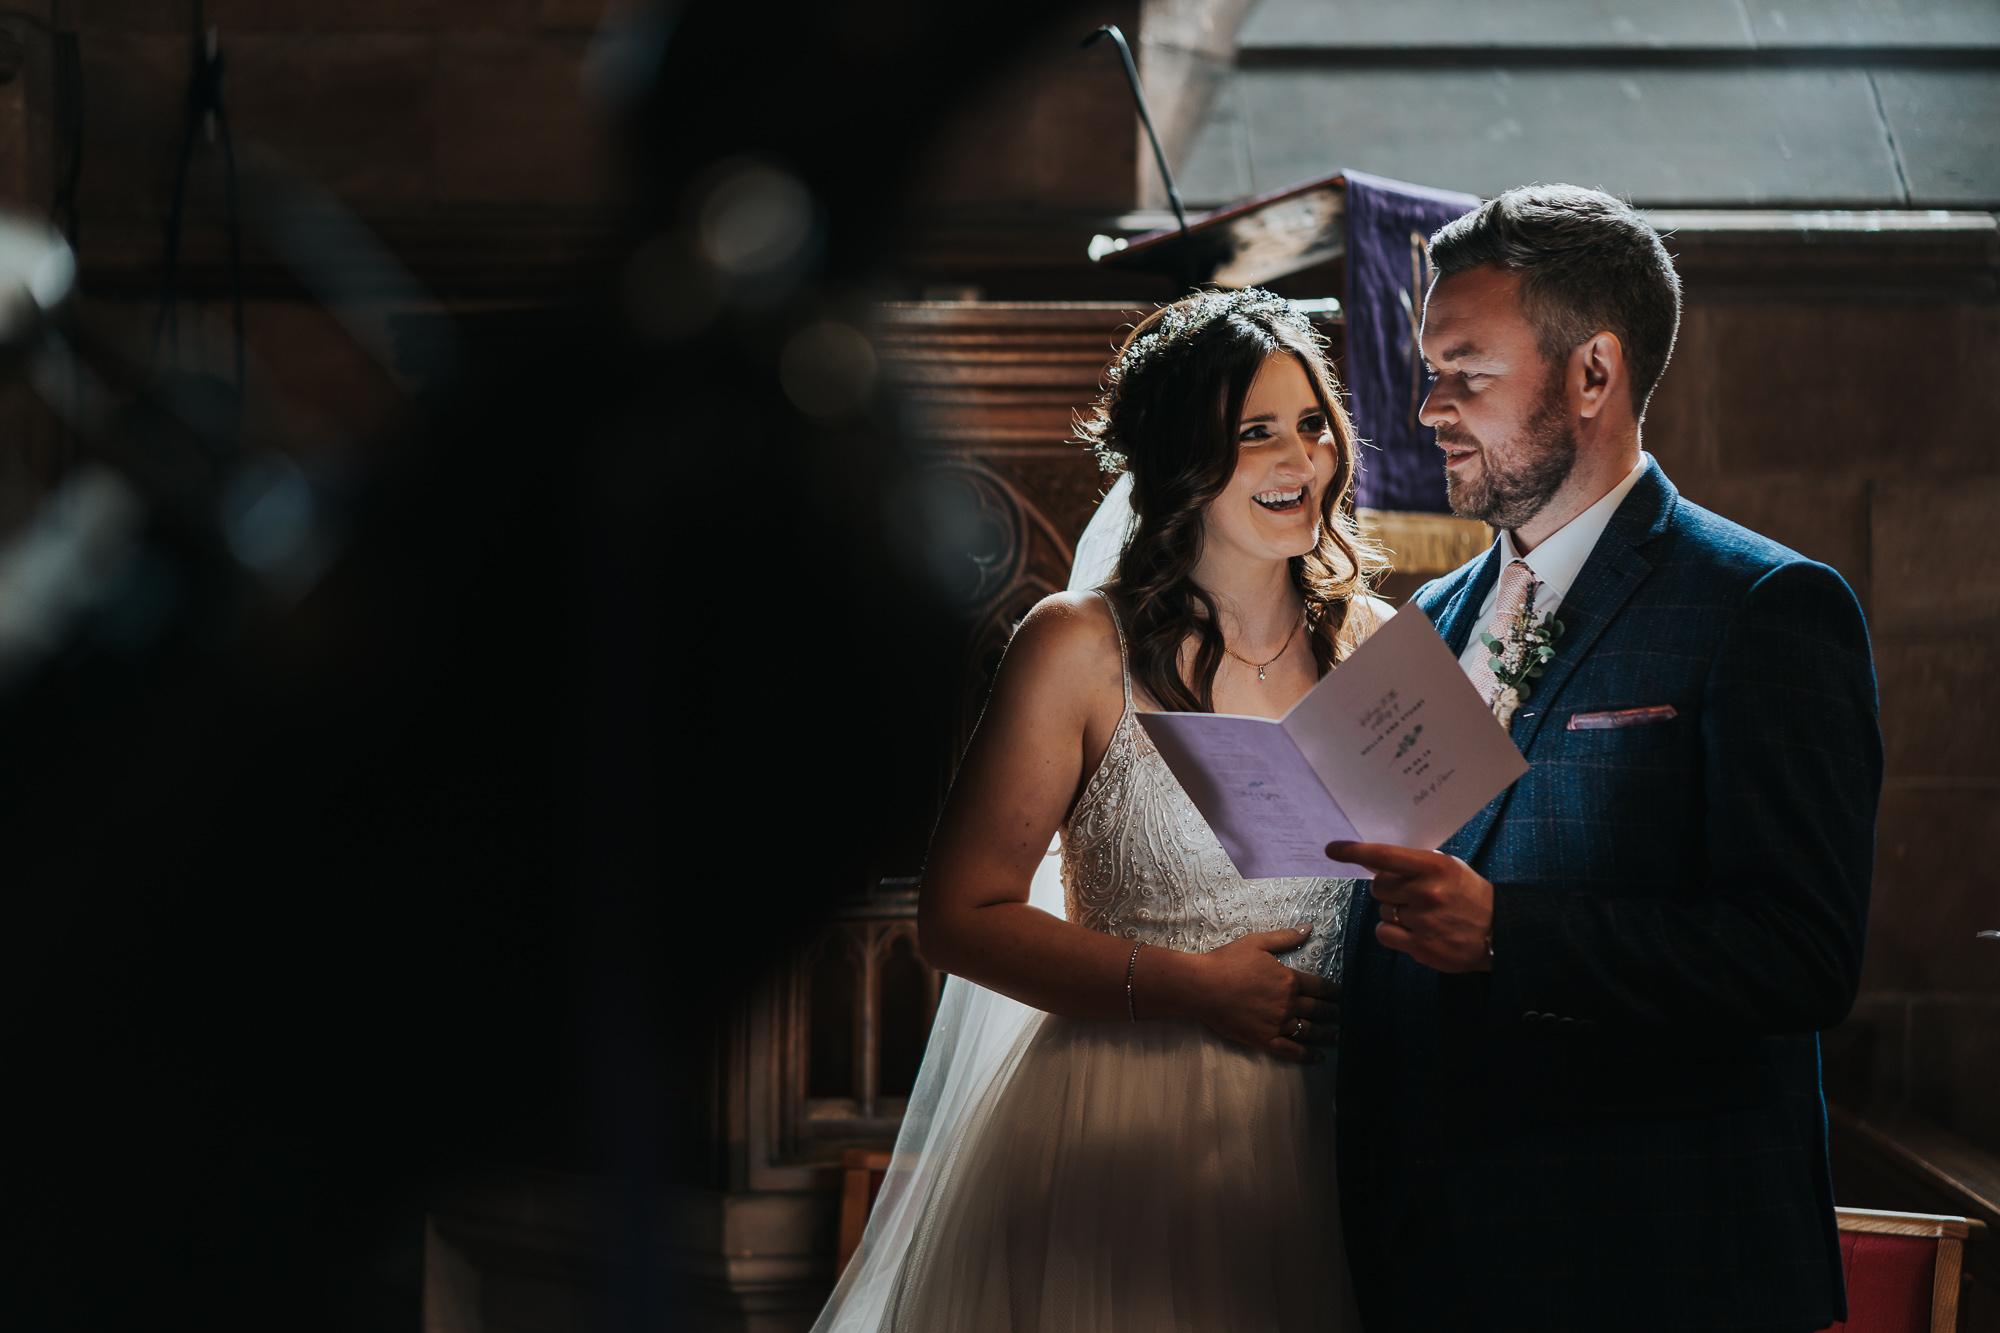 farm wedding in cheshire wedding photographer based in liverpool  (9 of 36).jpg